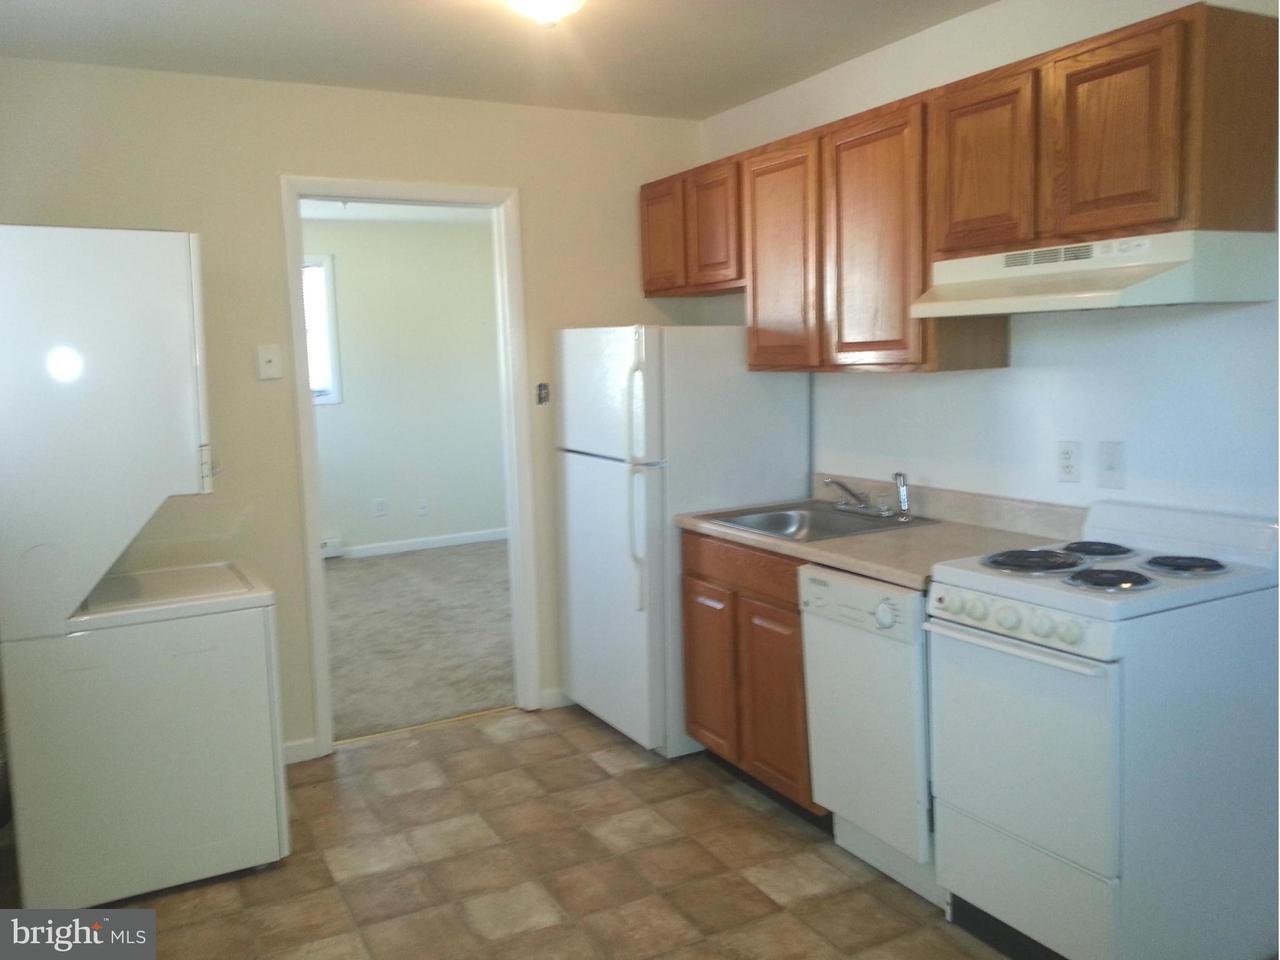 Additional photo for property listing at 142 Hillcrest Dr  Fredericksburg, Virginia 22401 United States